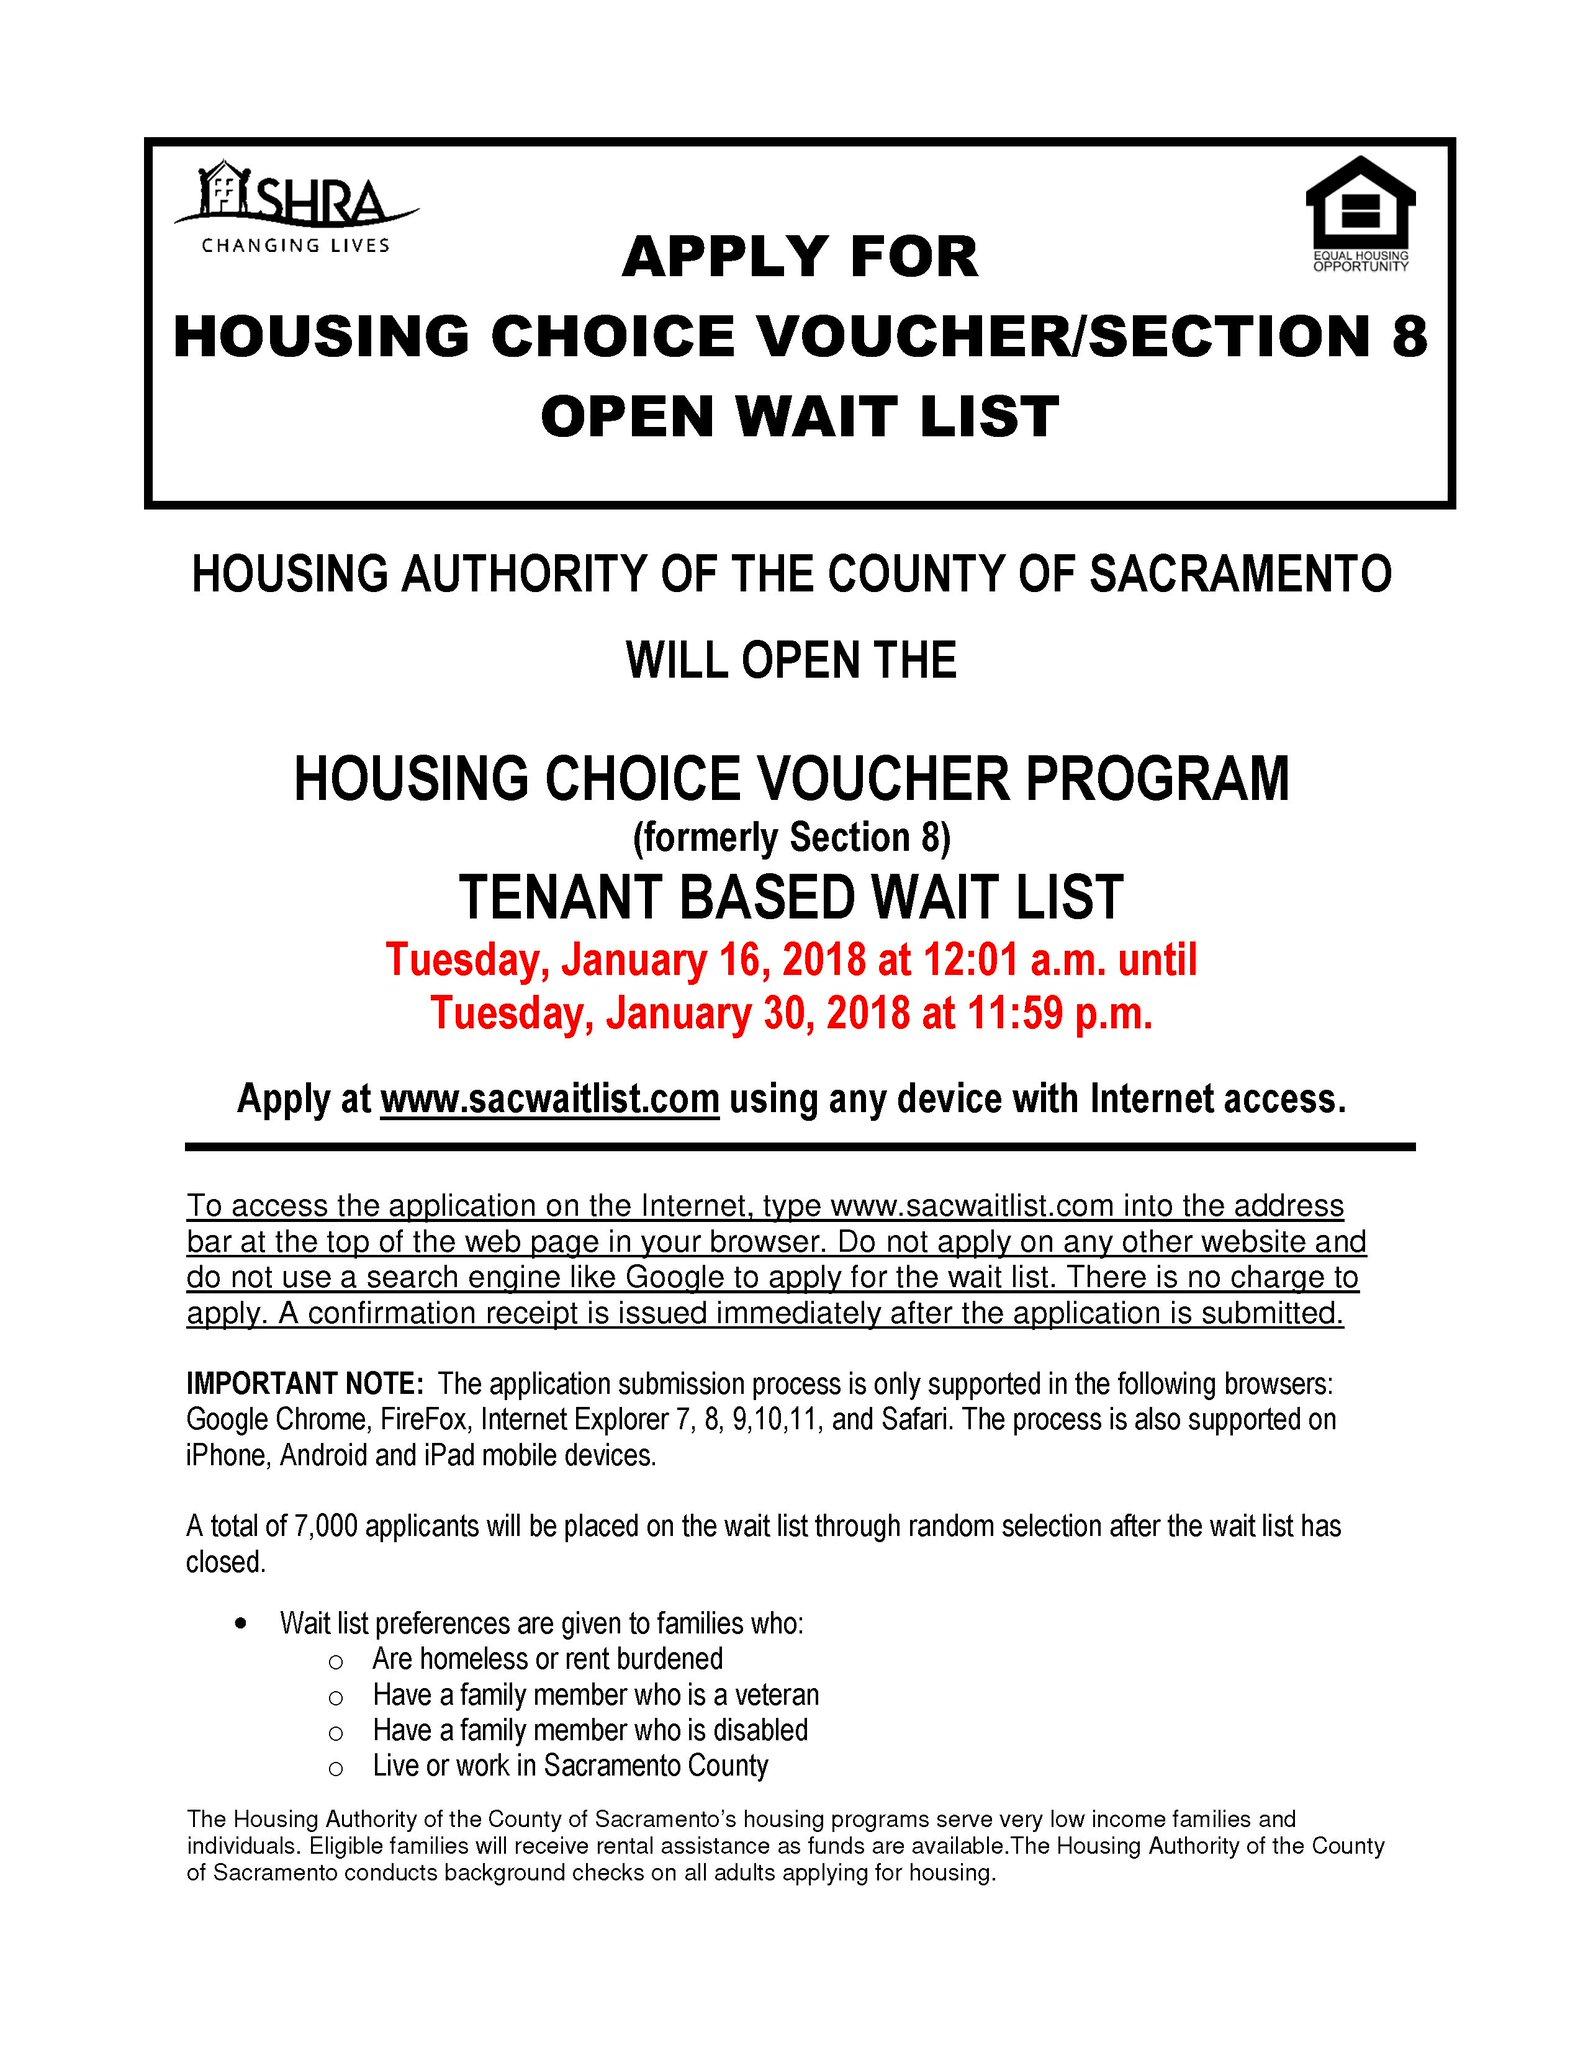 Mutual Housing CA on Twitter: